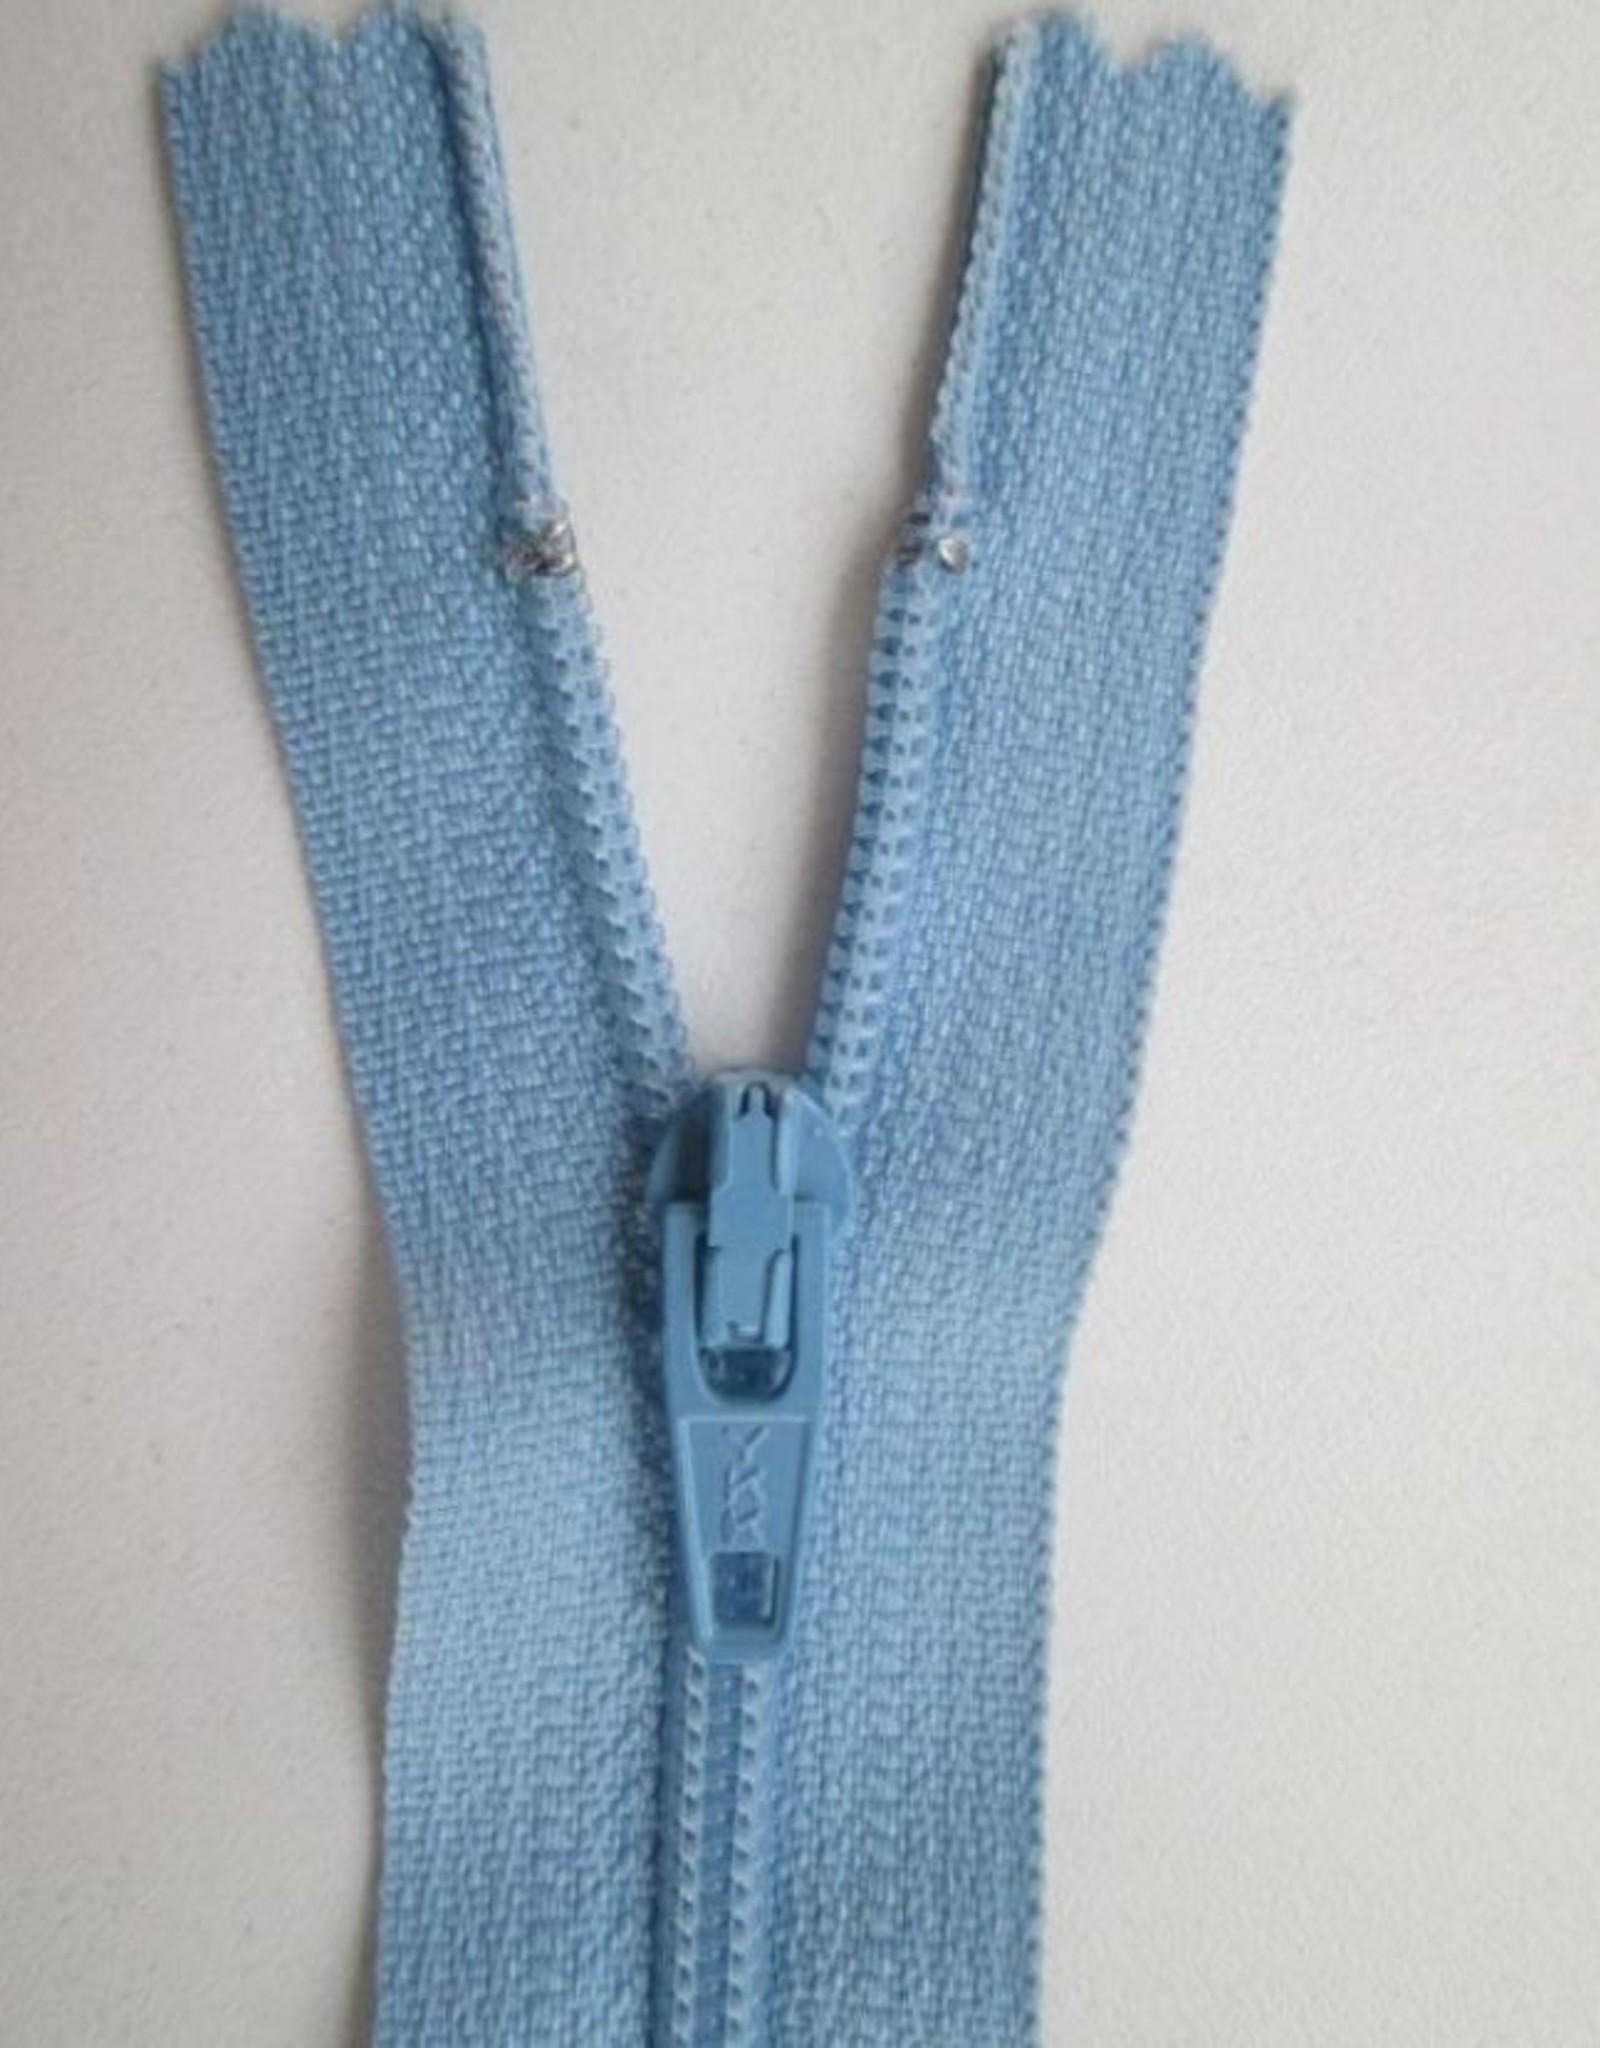 YKK Spiraalrits niet-DB 3mm midden blauw 546-18cm